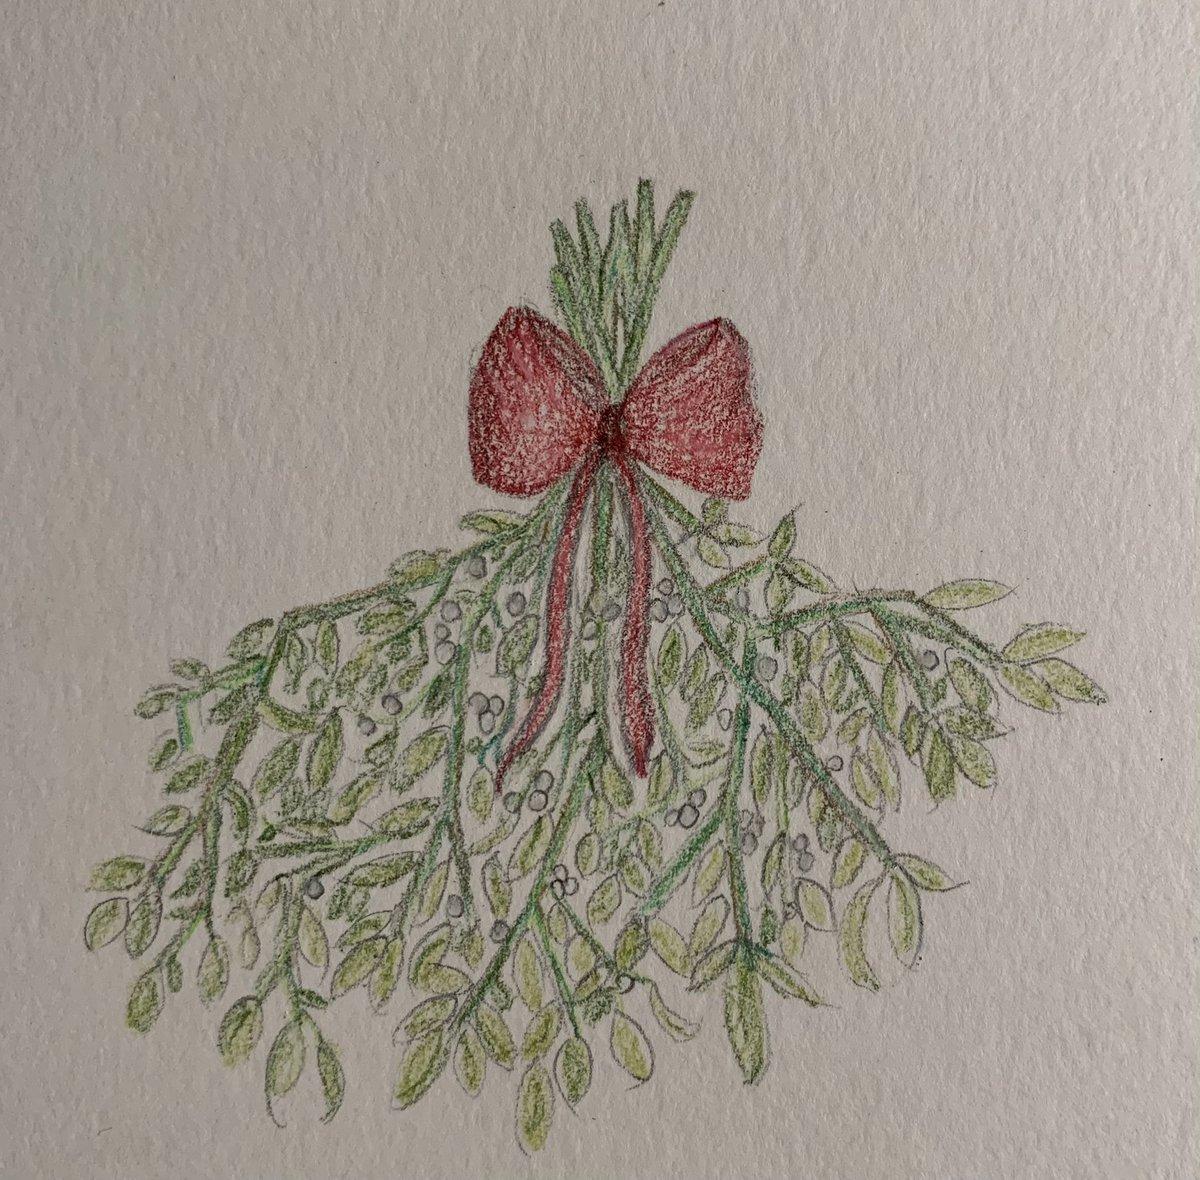 No SnowGlobe. Mistletoe instead!